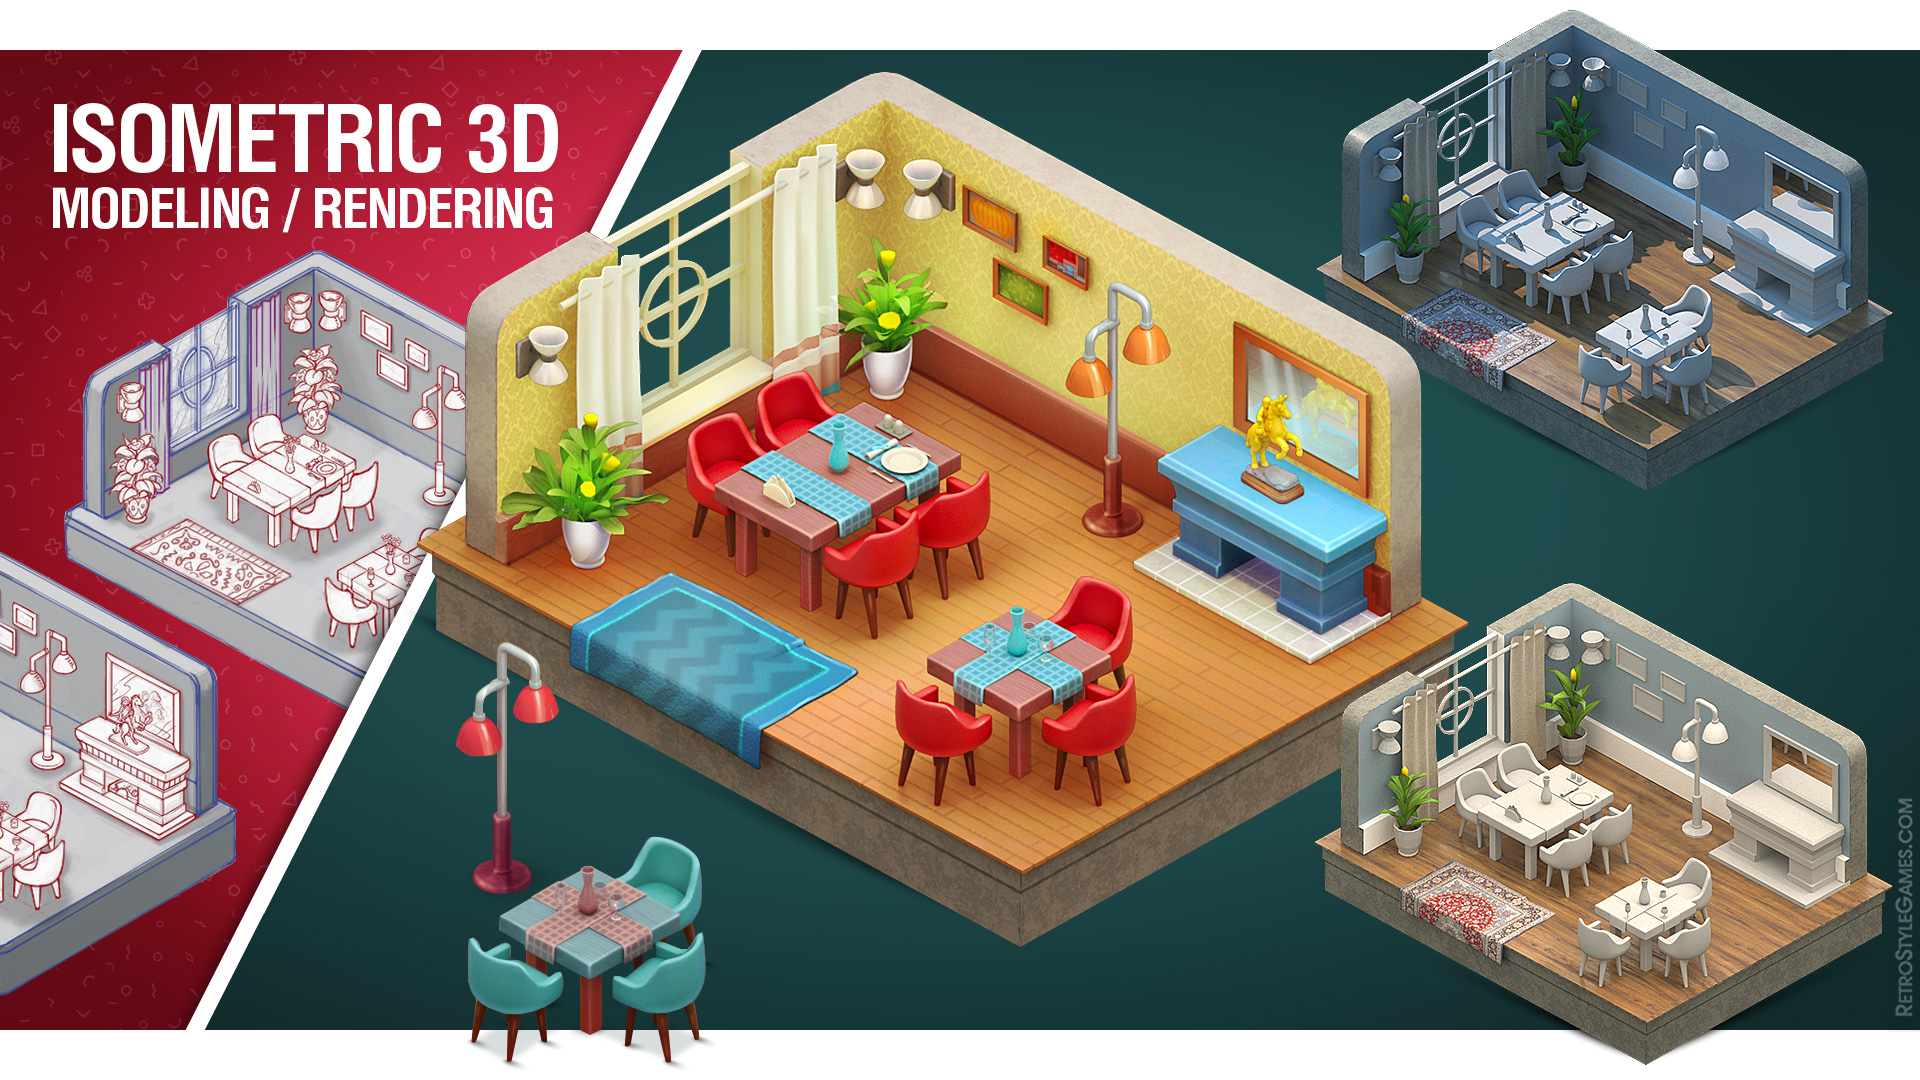 Isometric Room 3D Modeling Rendering How to Make